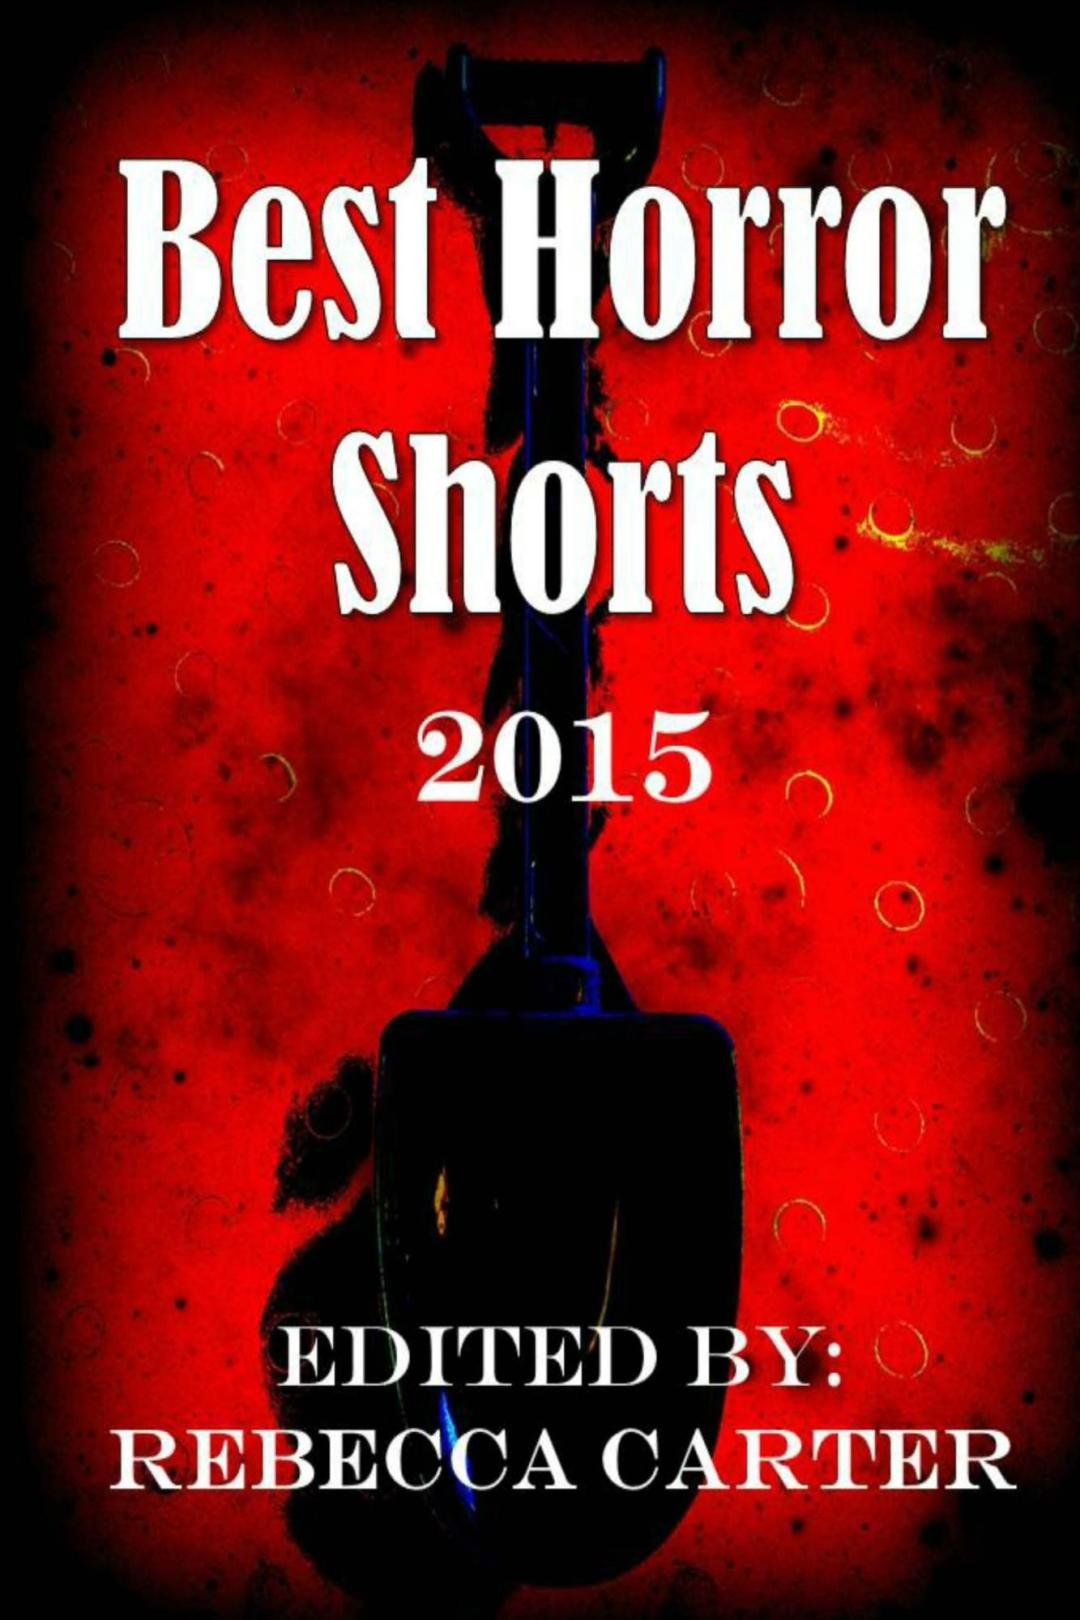 Best Horror Shorts 2015